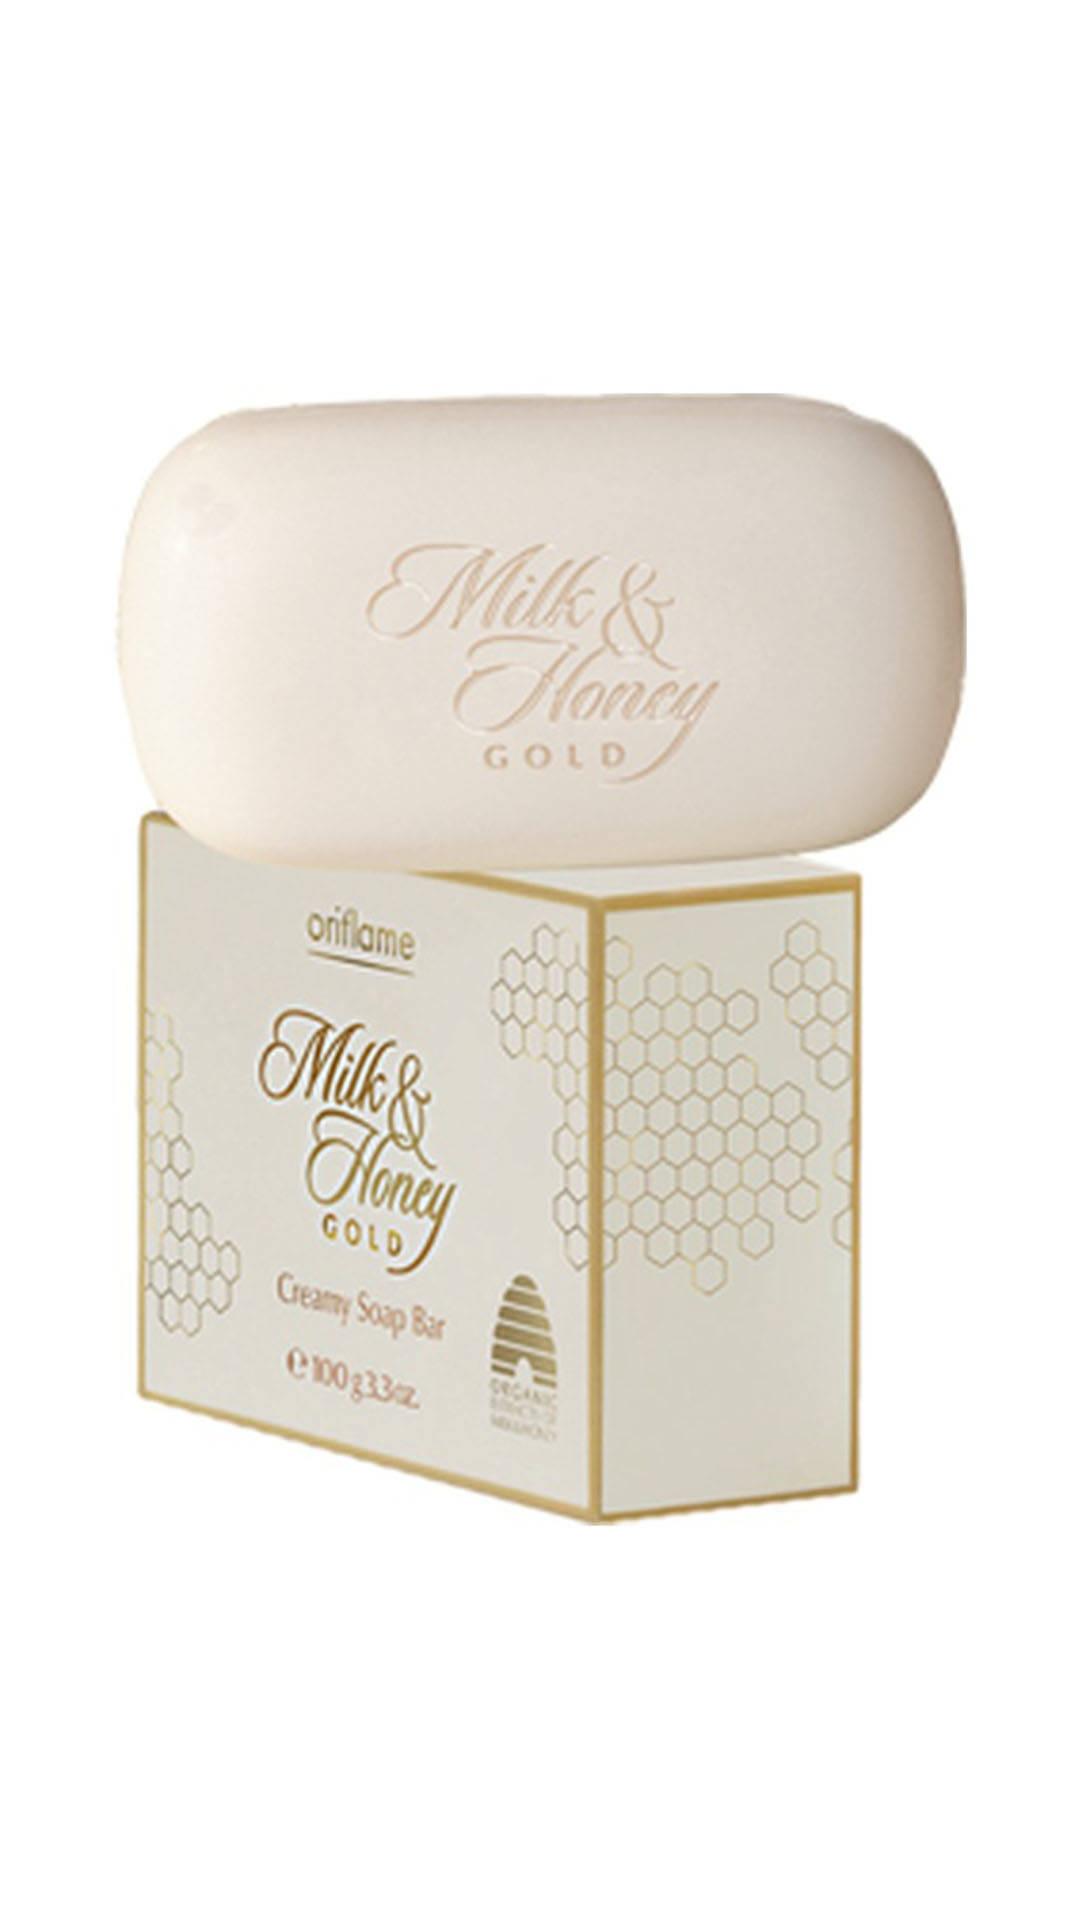 ORIFLAME MILK & HONEY GOLD CREAMY SOAP Reviews, ORIFLAME